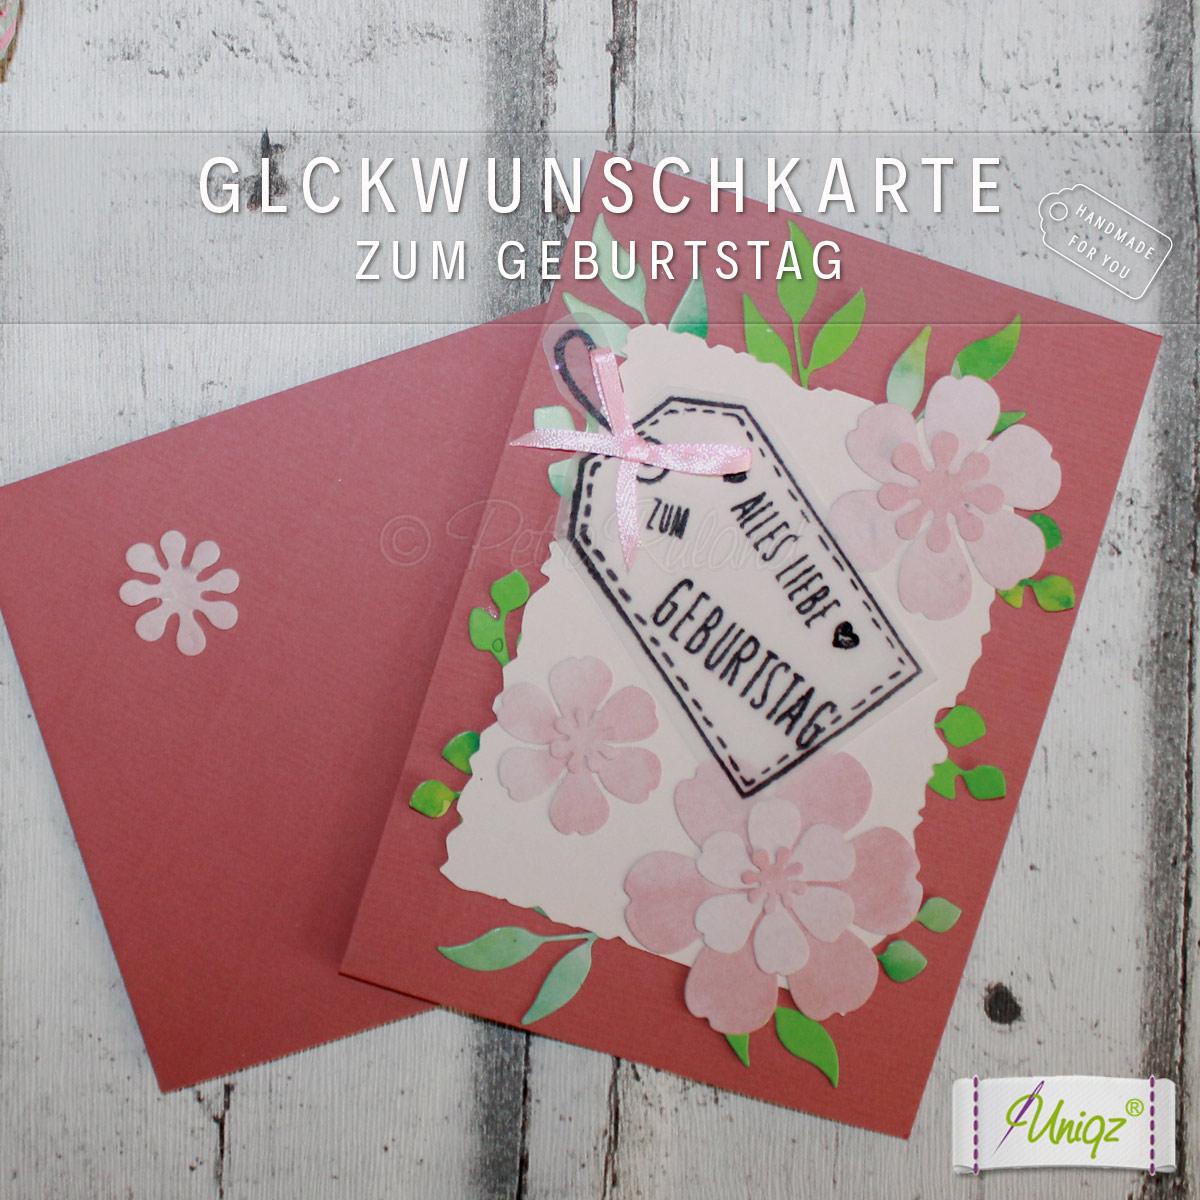 Glückwunschkarte floral